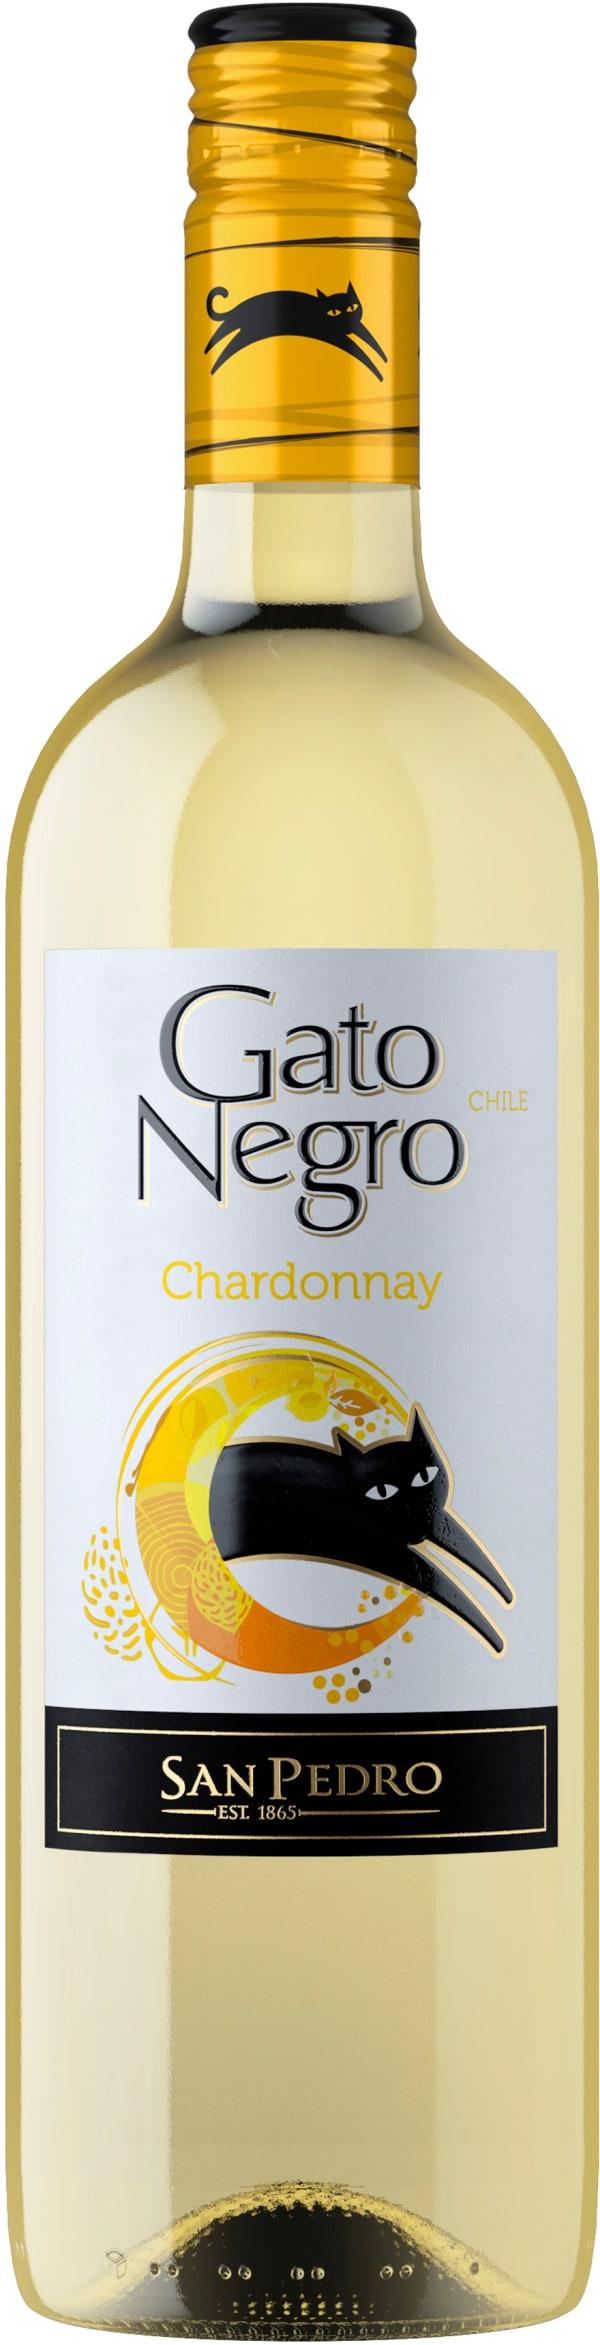 Gato Negro Chardonnay 2020